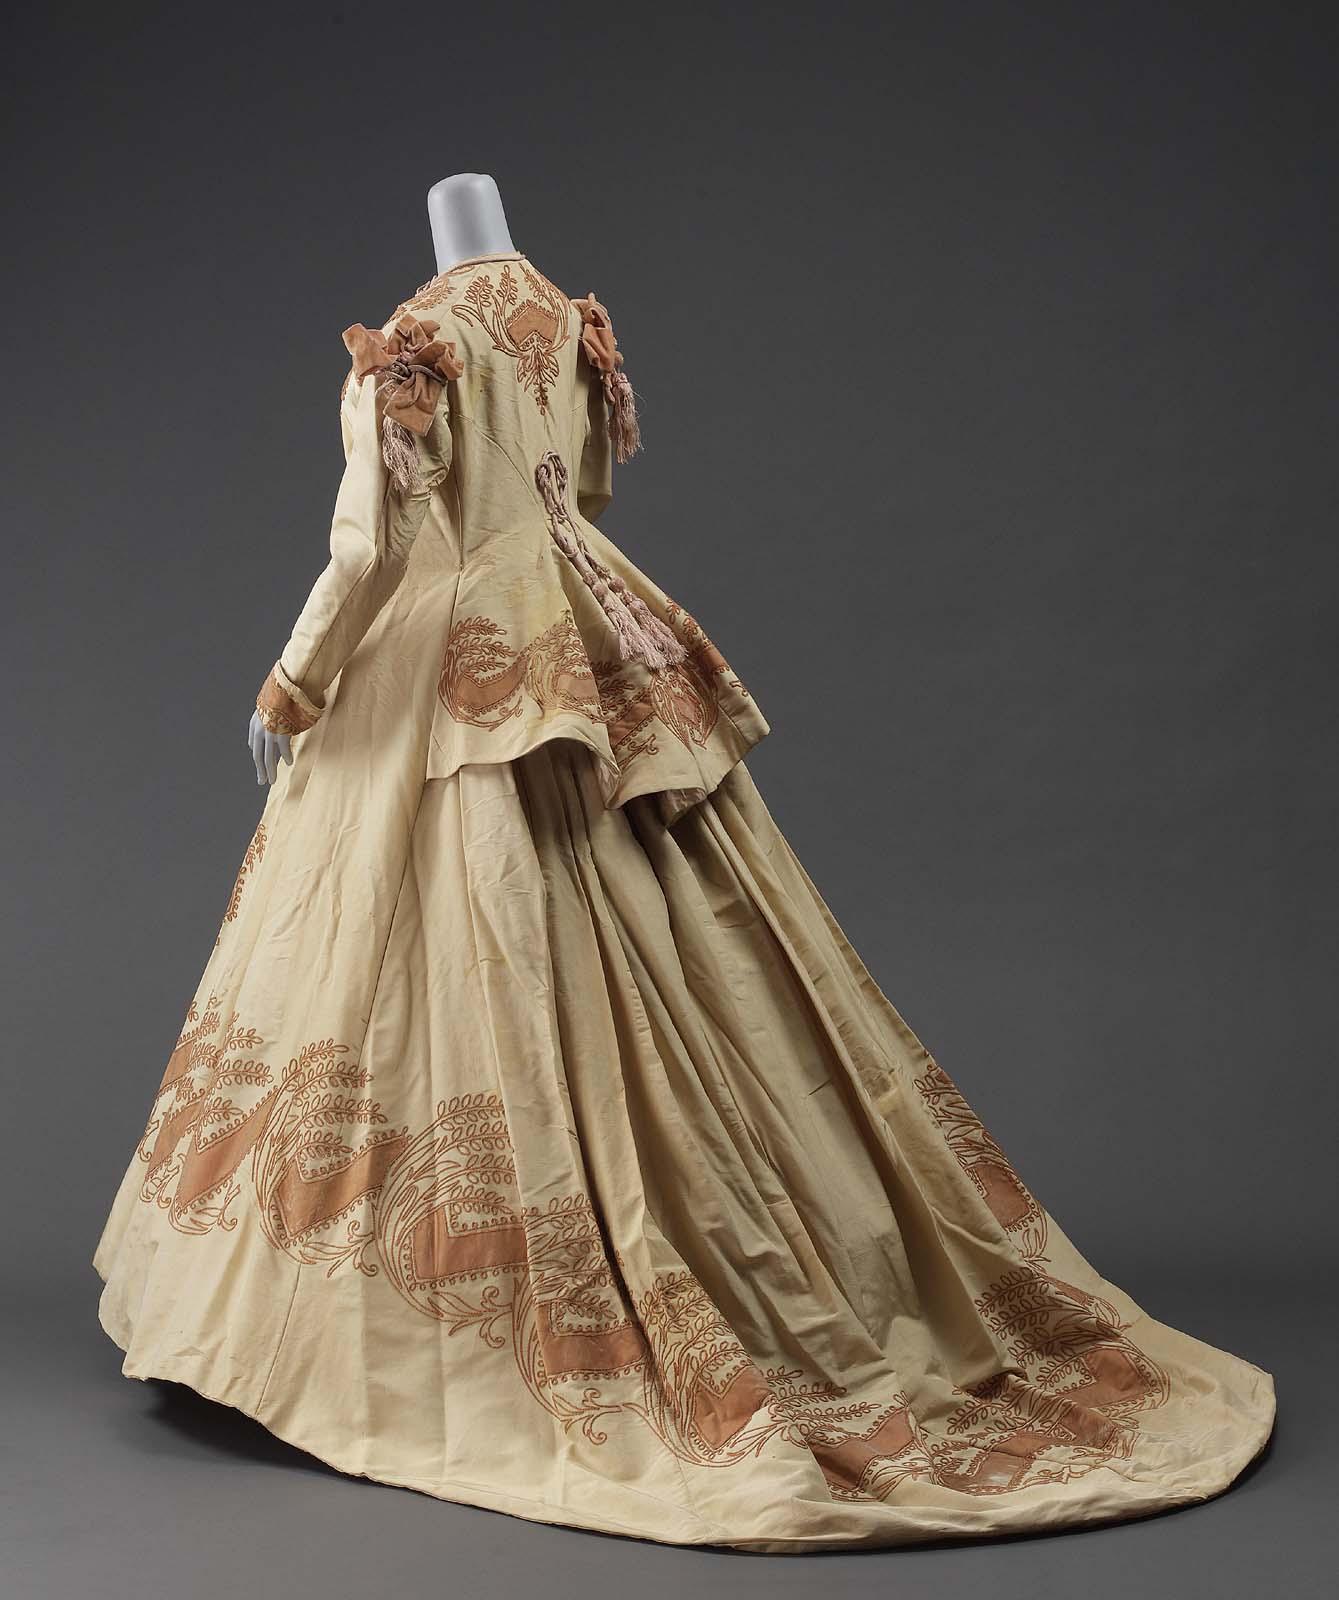 Robe of ribbed silk, American or French 1865–70, MFA Boston, 64.1002